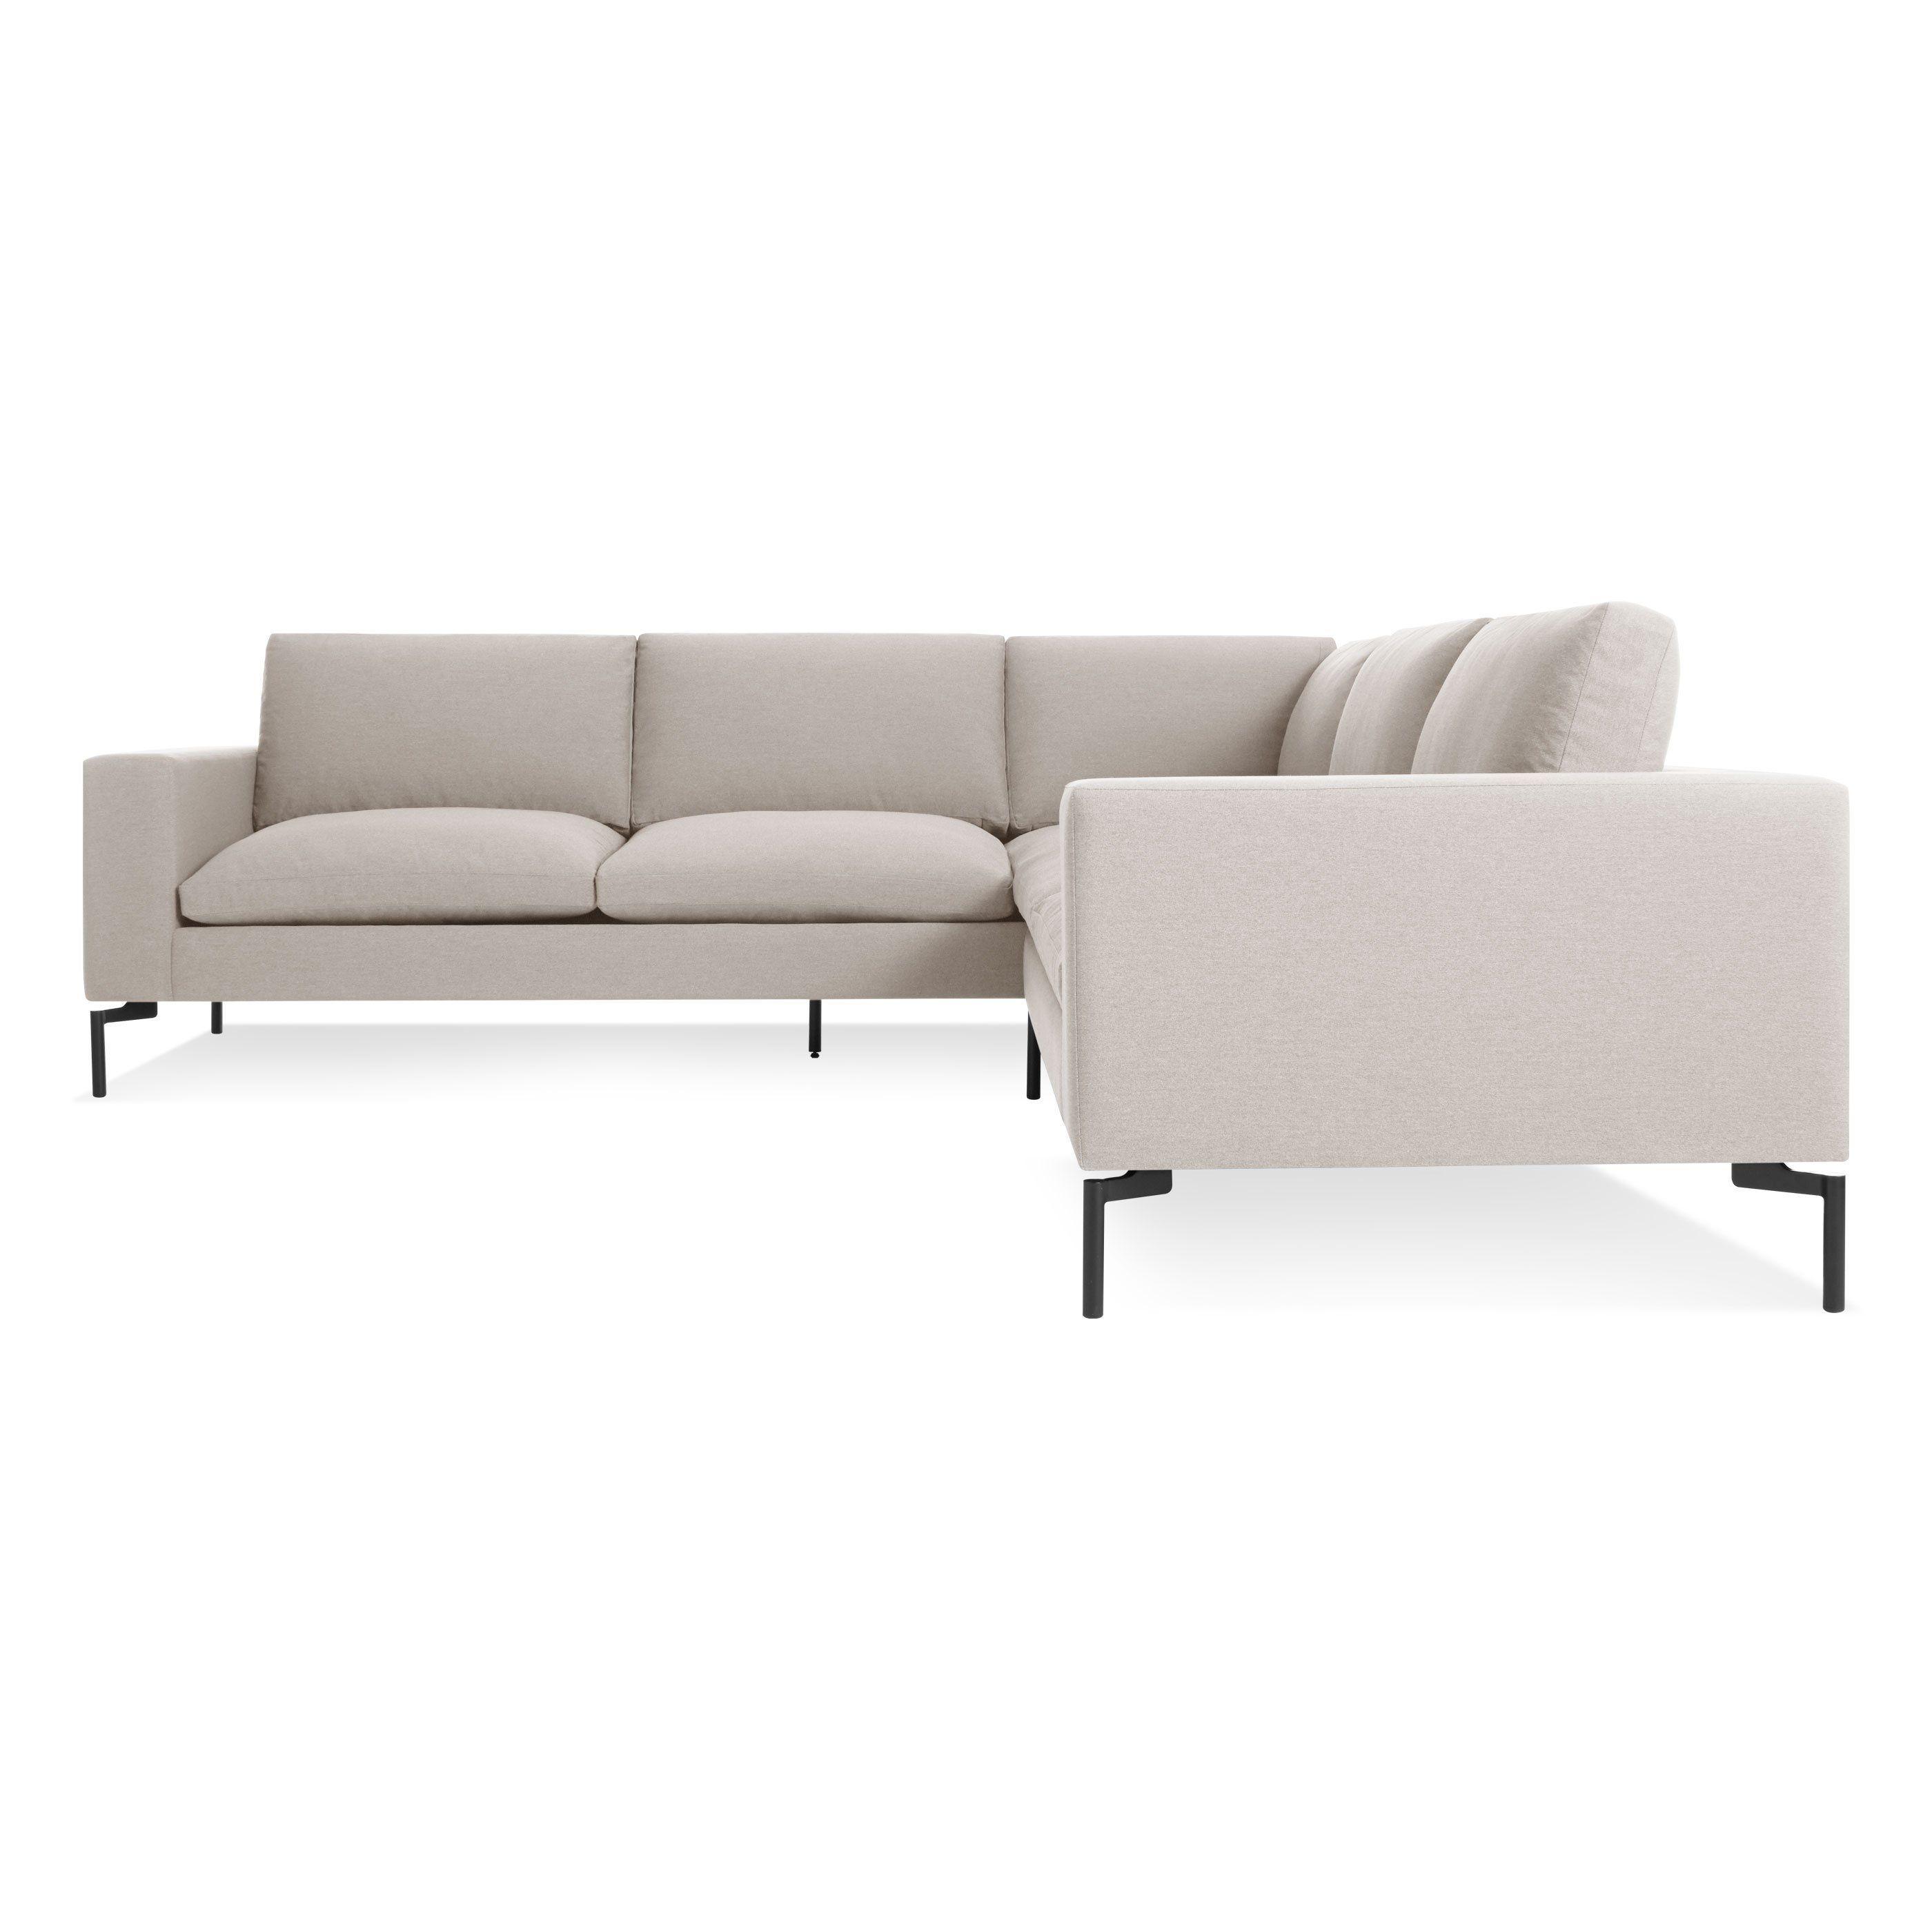 Blu Dot New Standard Left Sectional Sofa Small Small Sectional Sofa Sectional Sofa Modern Sofa Sectional